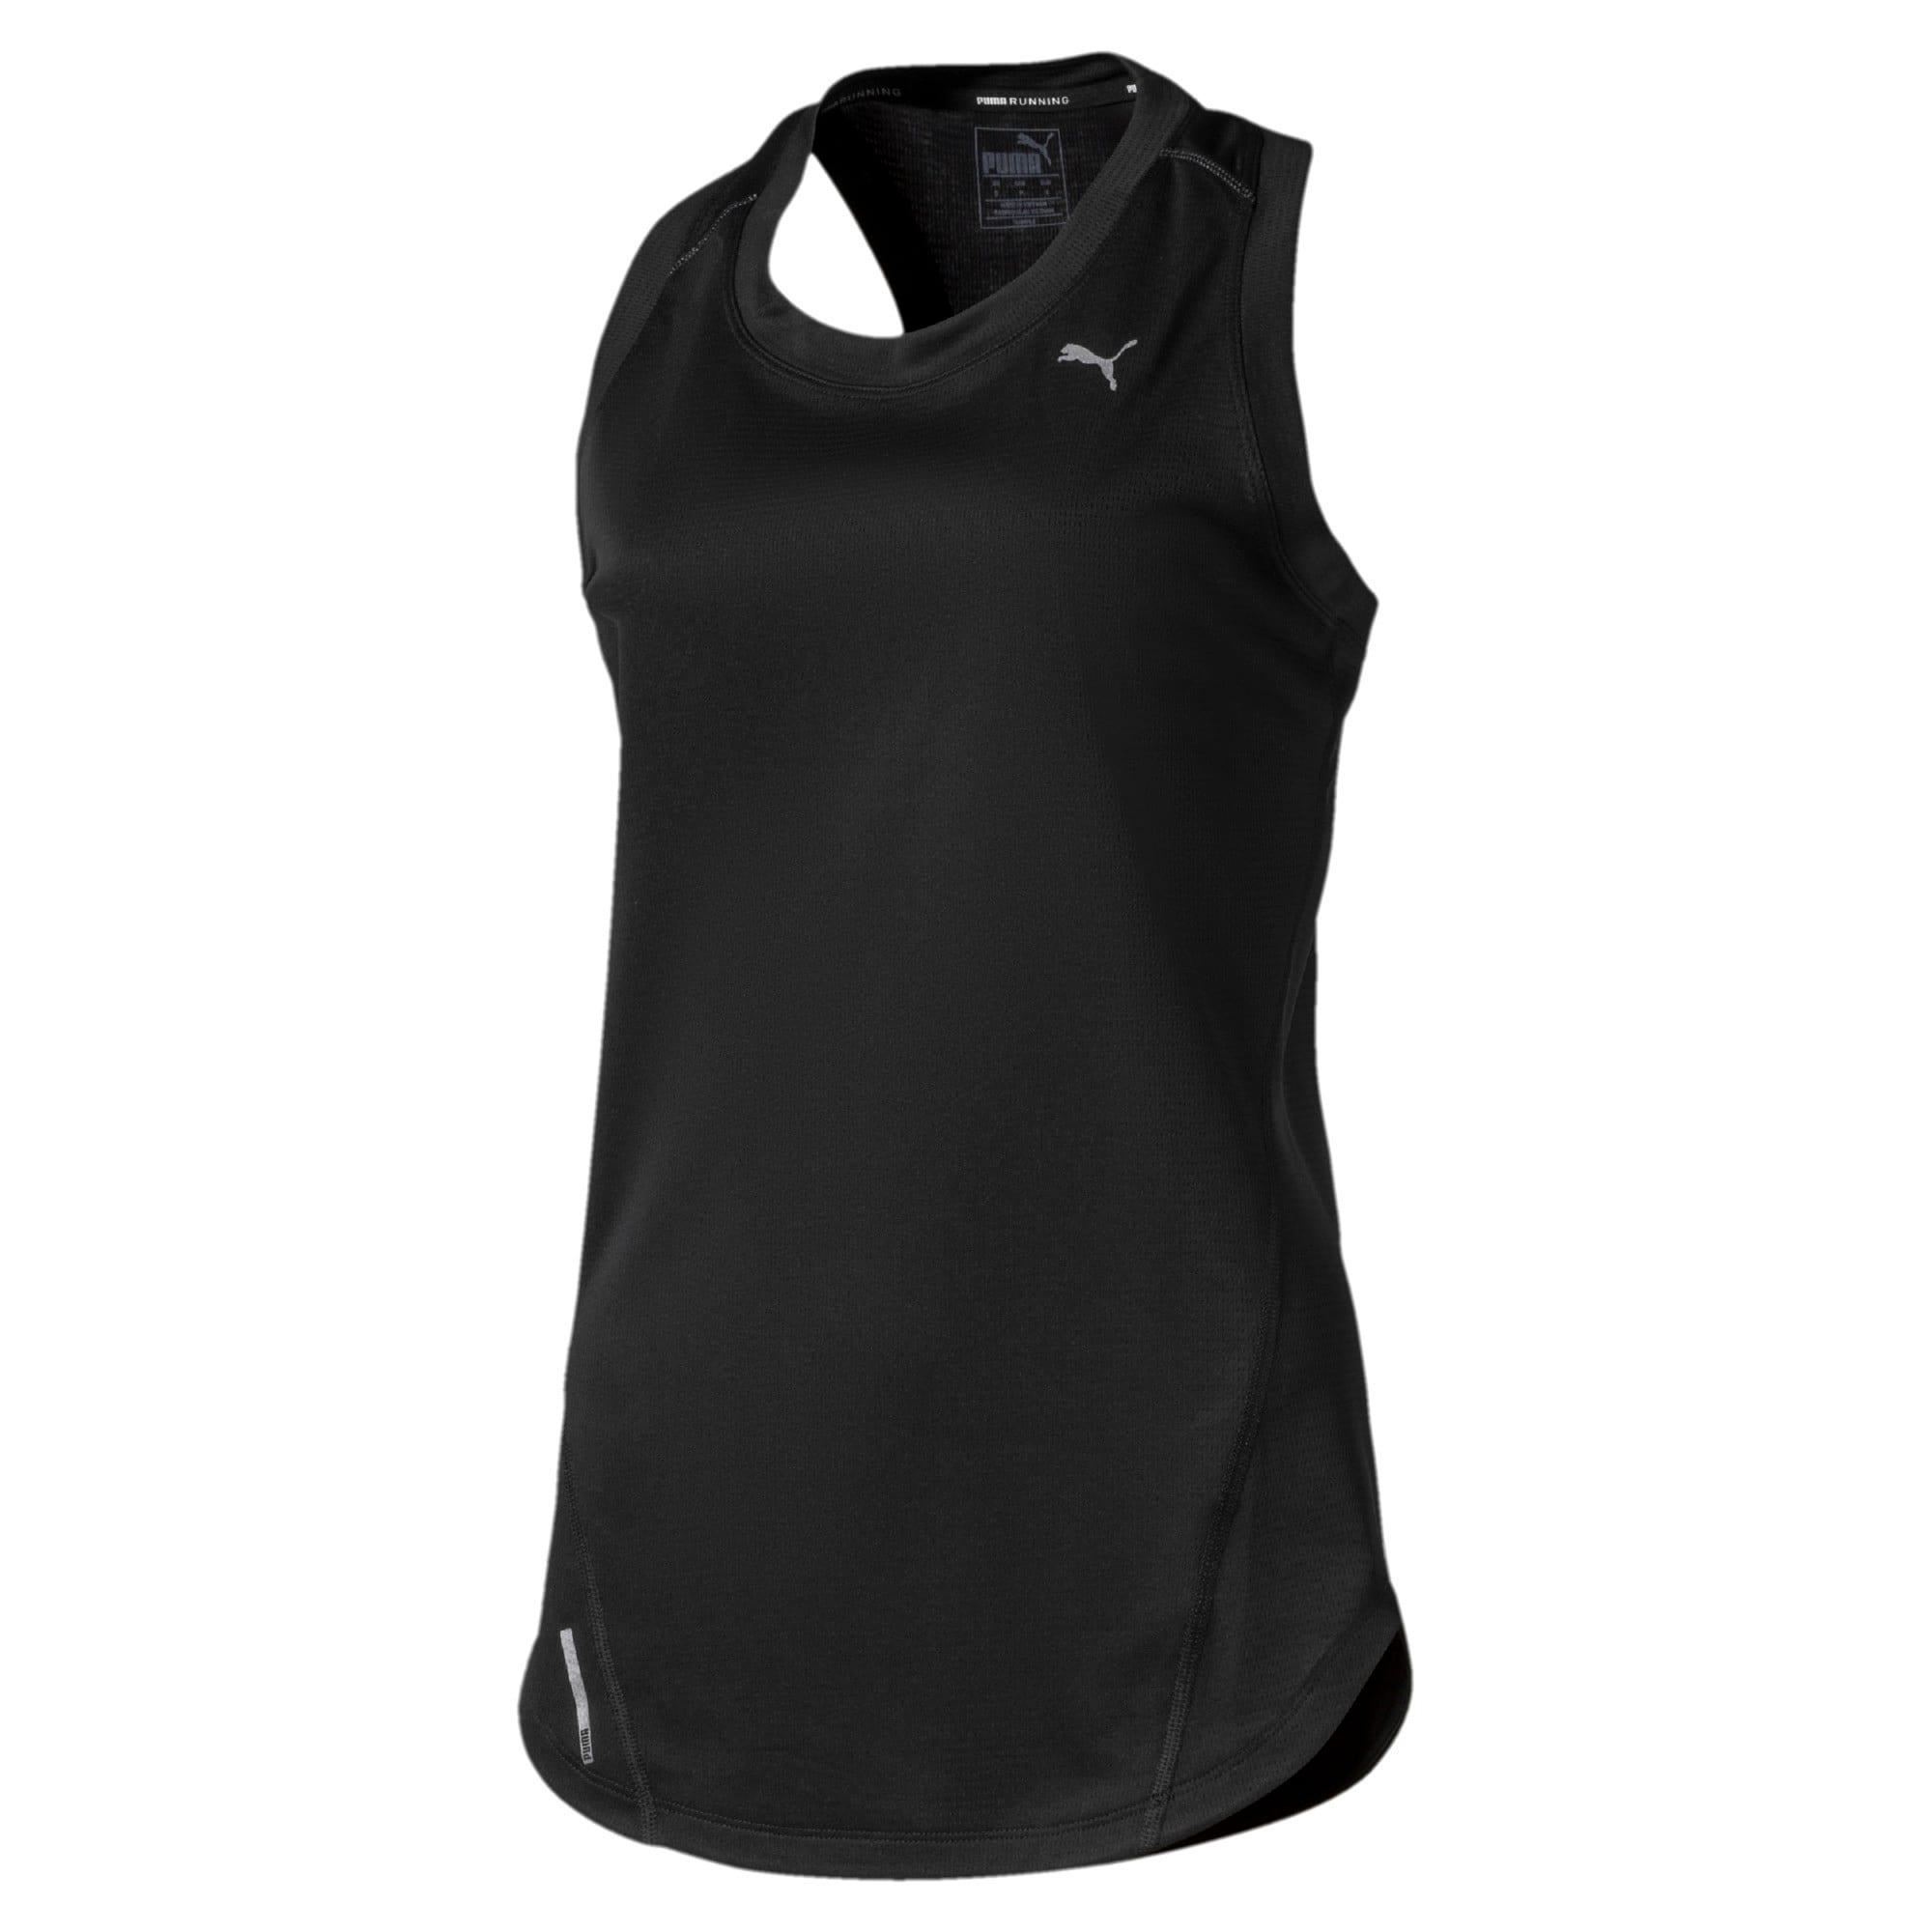 Thumbnail 4 of IGNITE Women's Running Tank Top, Puma Black, medium